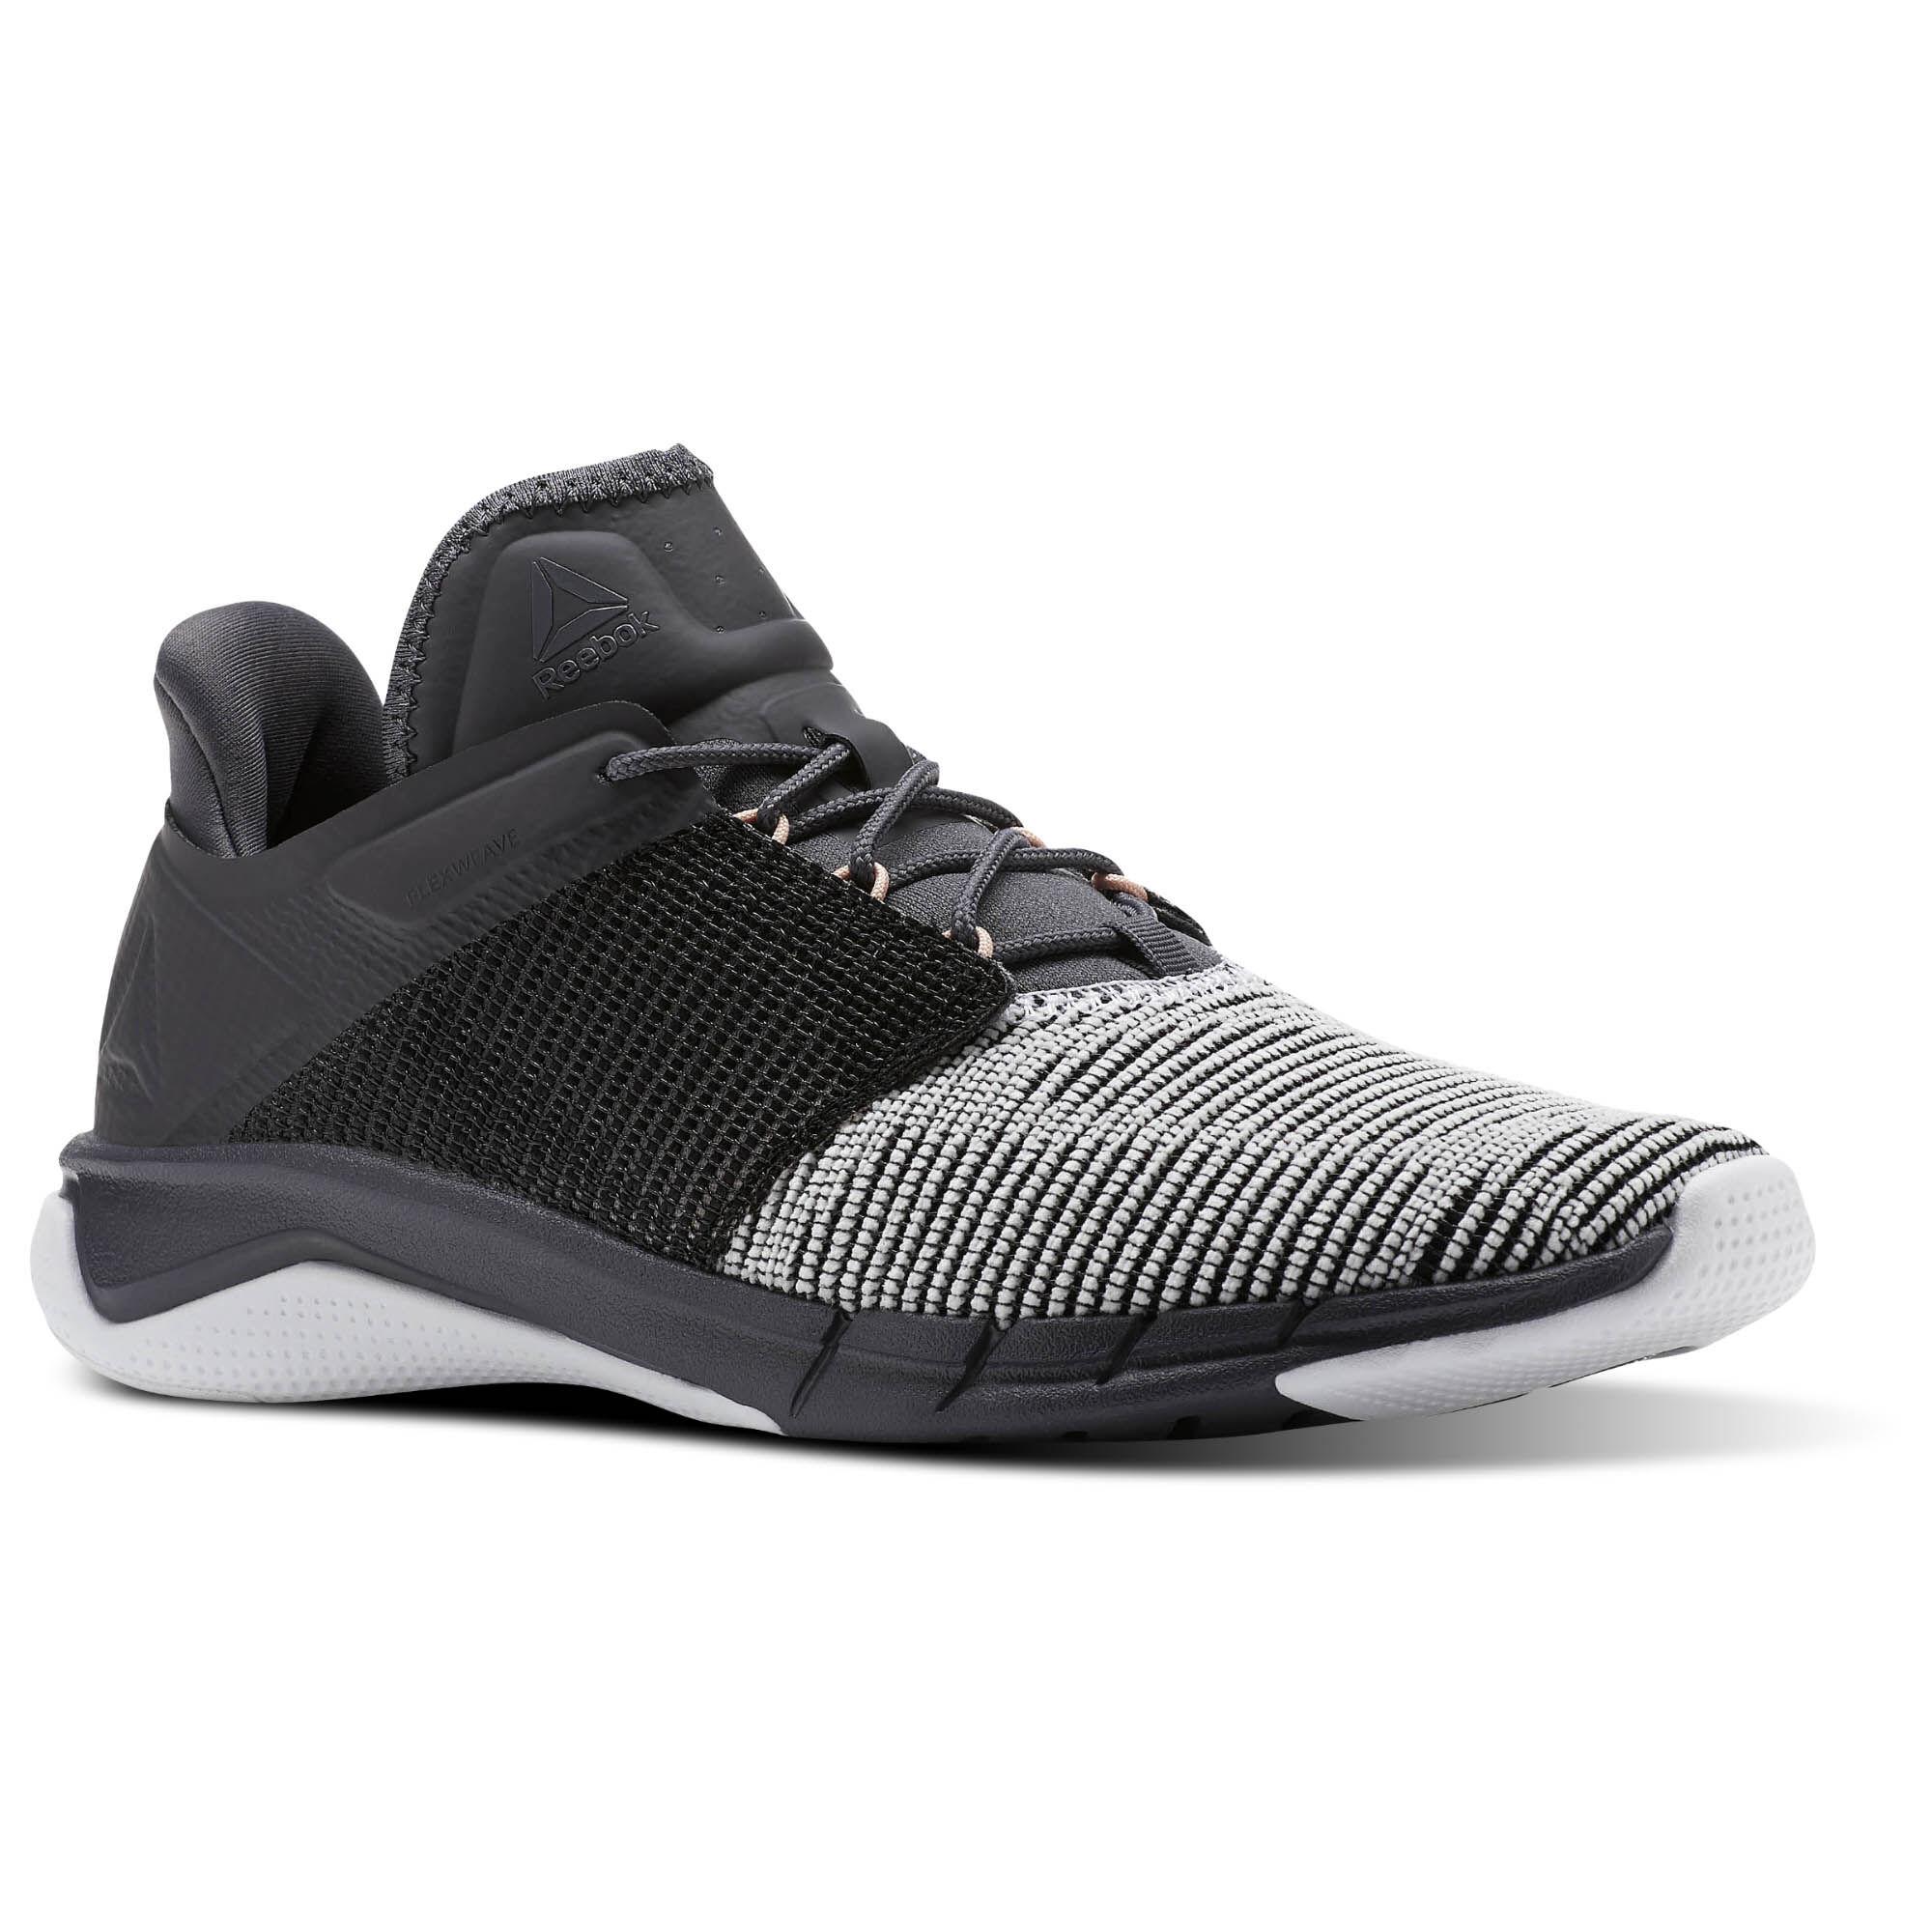 adidas shoes 3d printed diagram lm 317 circuit 632787